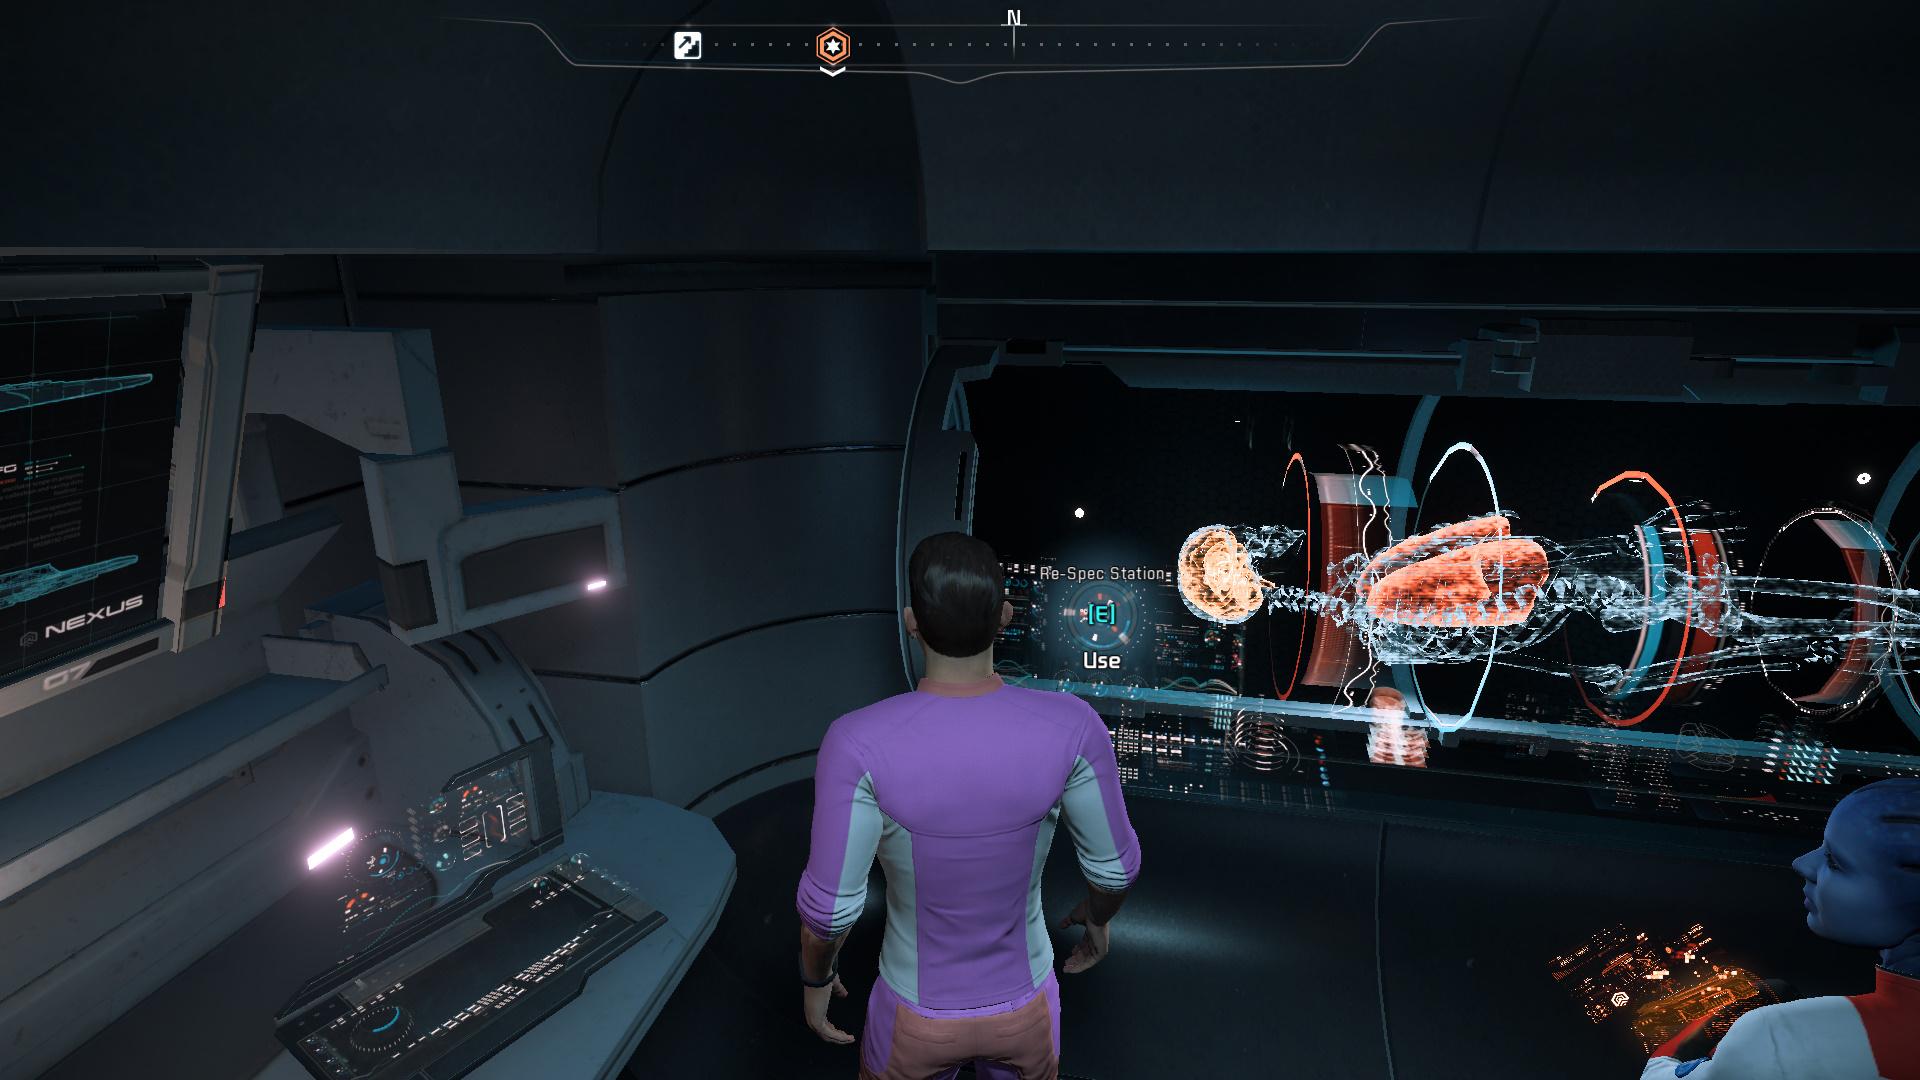 Mass Effect Andromeda Tempest 1333180 Hd Wallpaper